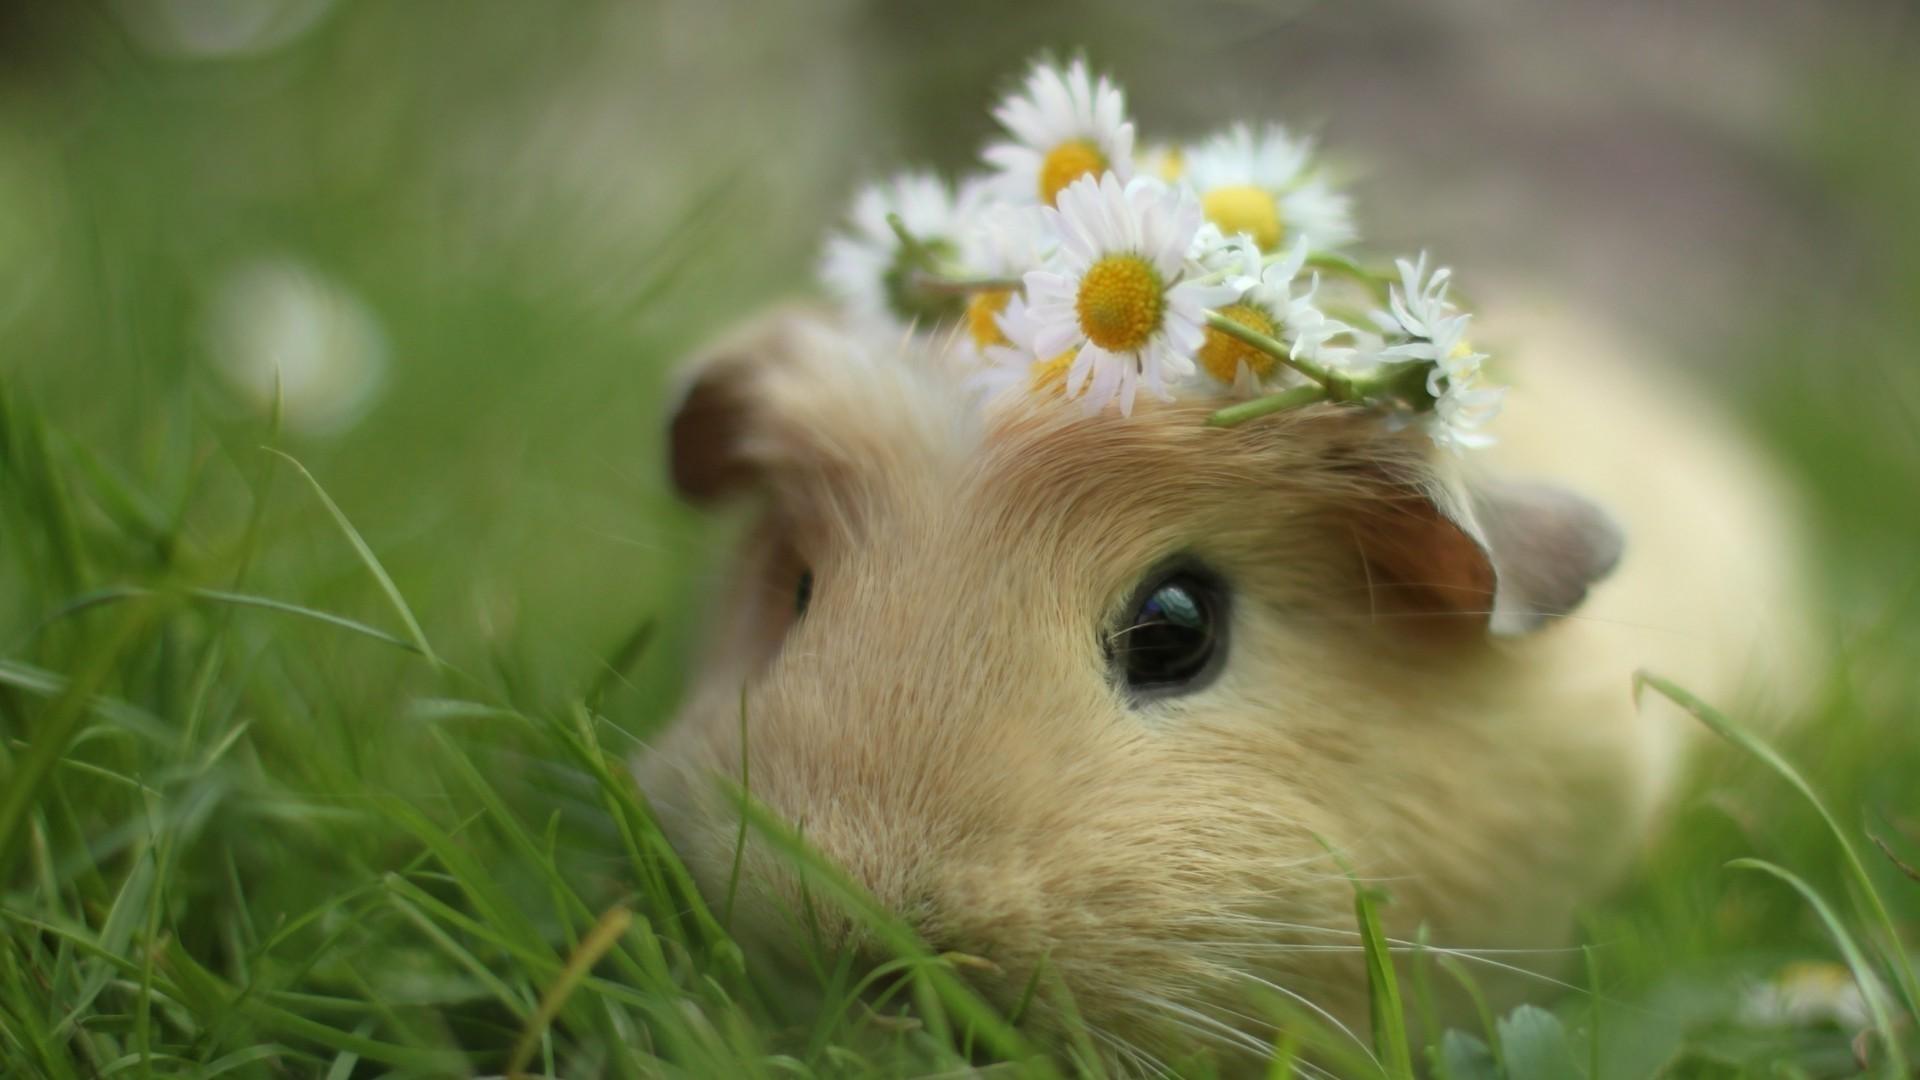 Cute Animal hd desktop wallpaper